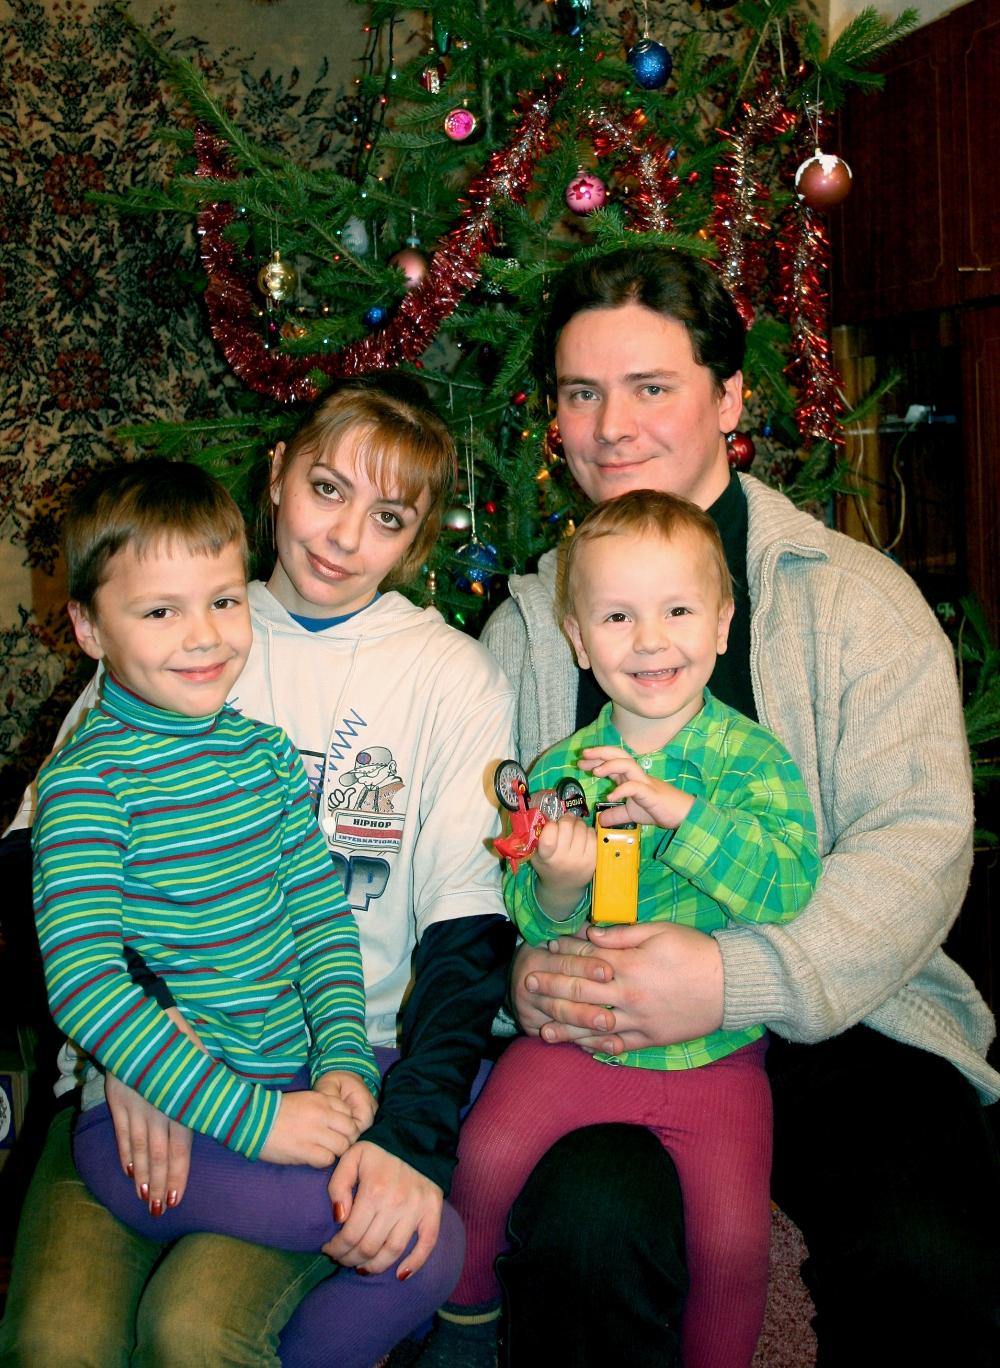 2006 г. Александр, Алёна, Никита и Артём Петровы.